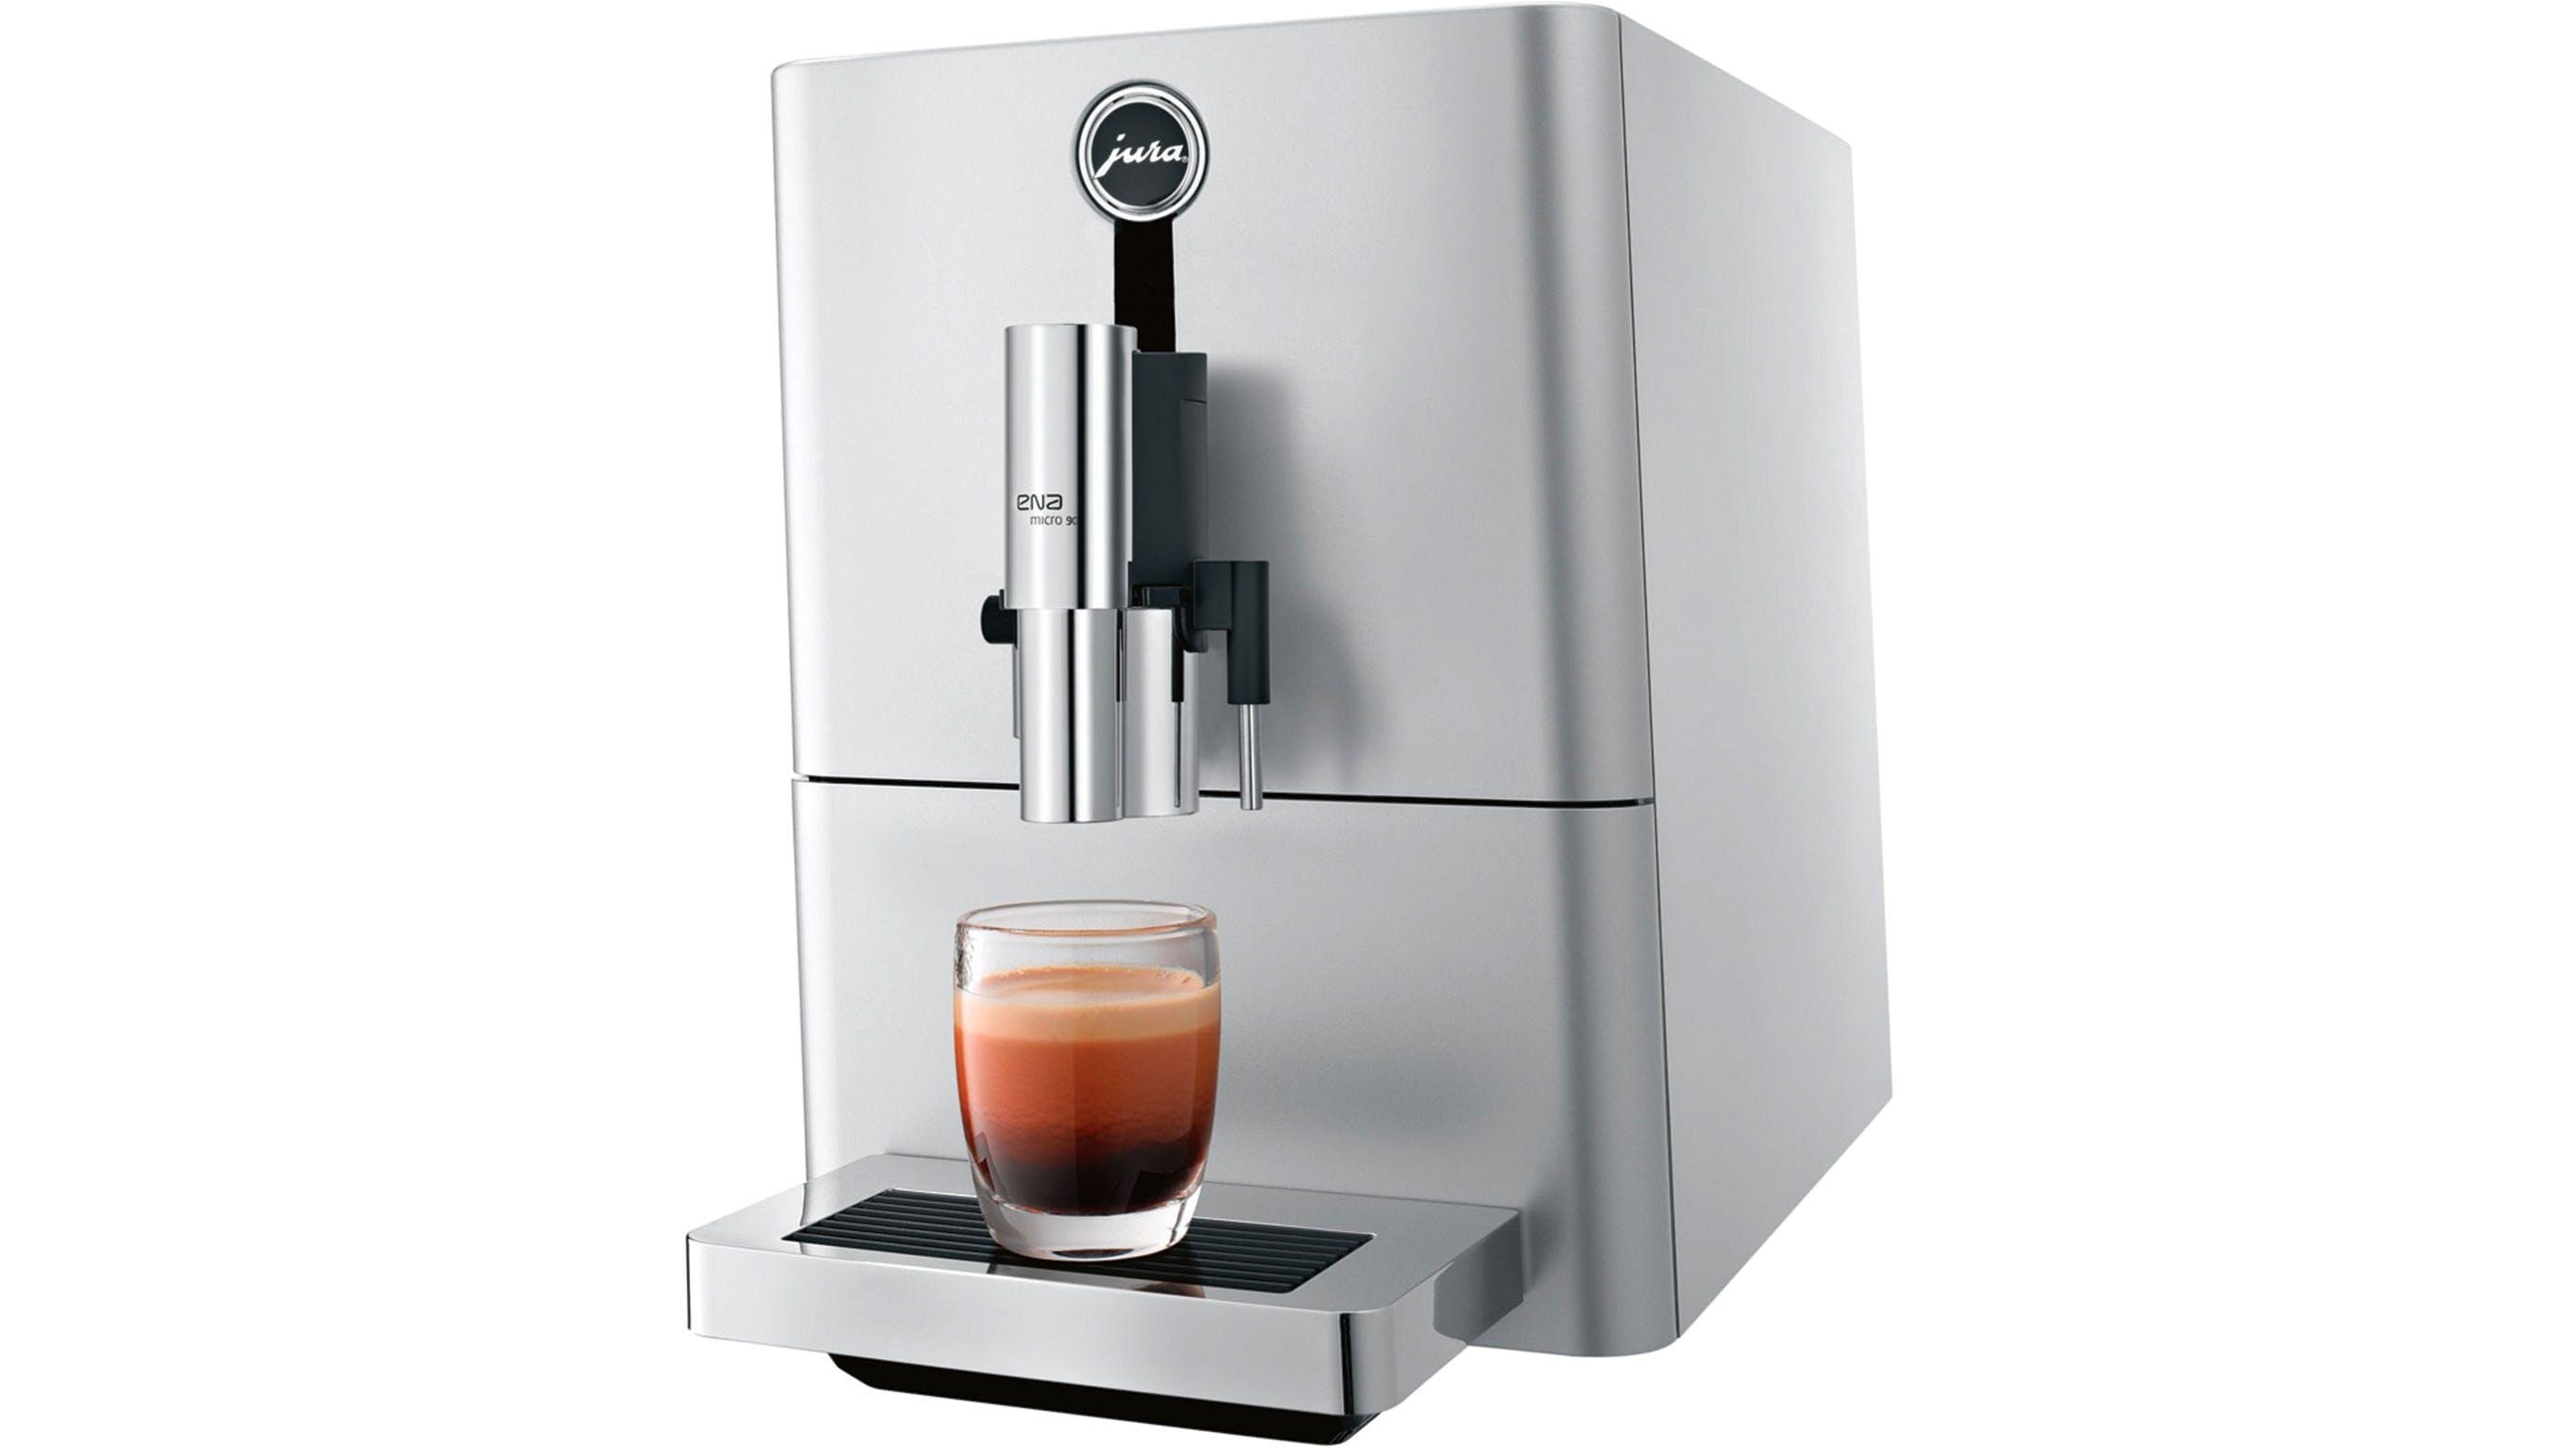 Electronic Jura Ena Coffee Machine jura ena micro 90 automatic coffee machine domayne machine